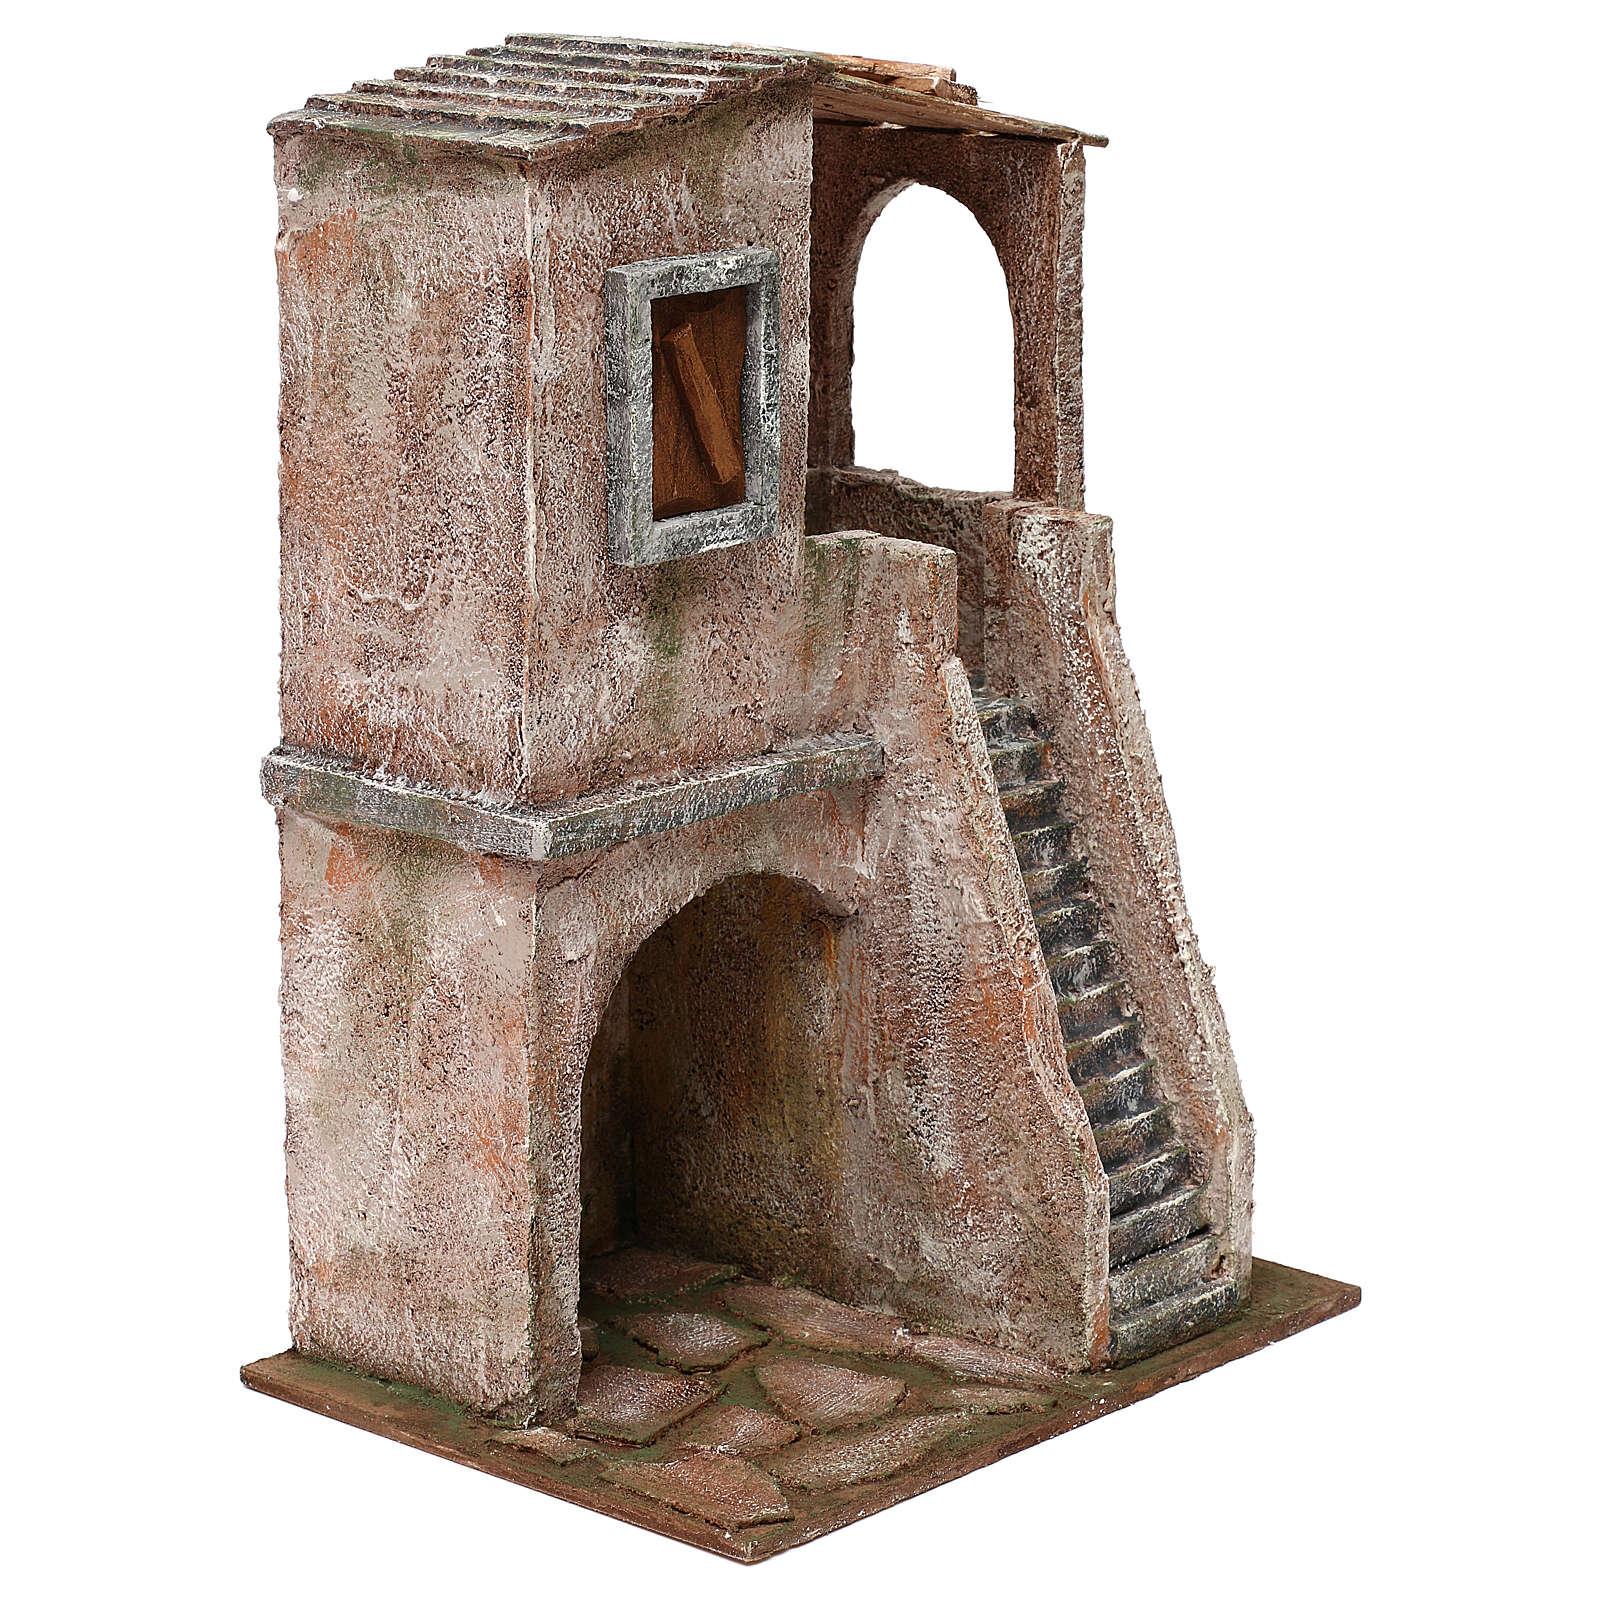 Casetta disposta su 2 piani comunicanti di 34x25x18 cm presepe 12 cm 4